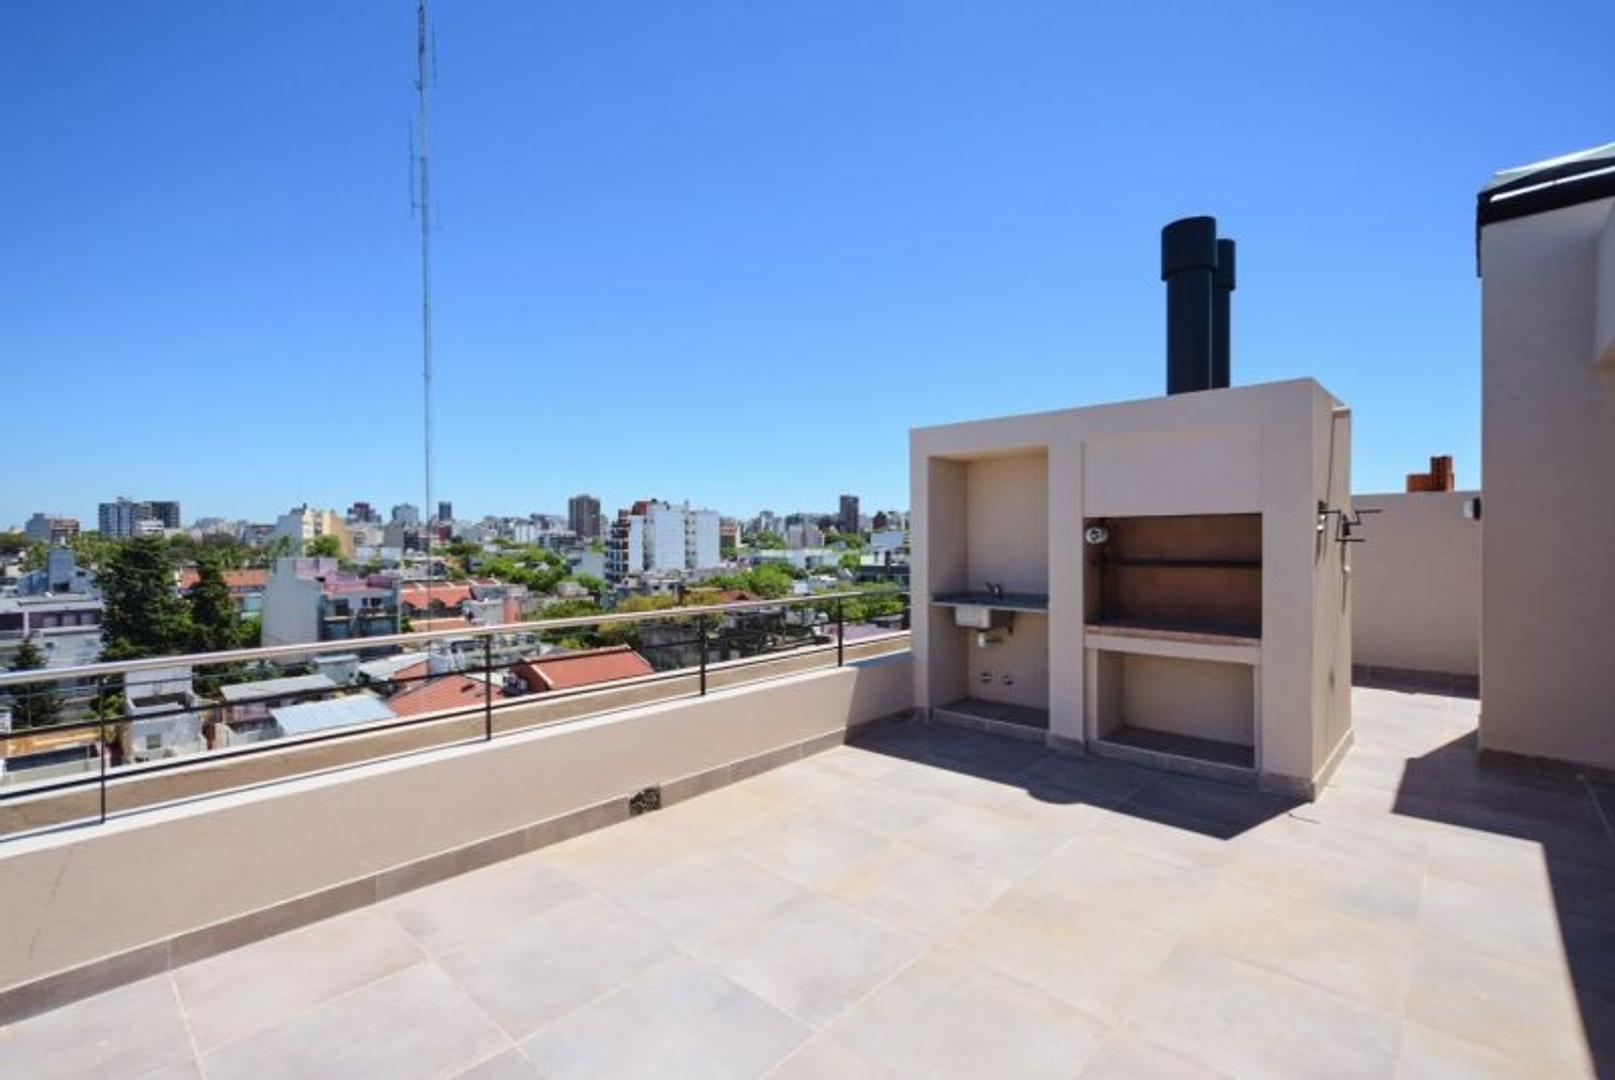 (CDP-CDP-374) Departamento - Venta - Argentina, Capital Federal - DONADO 1700 - Foto 21